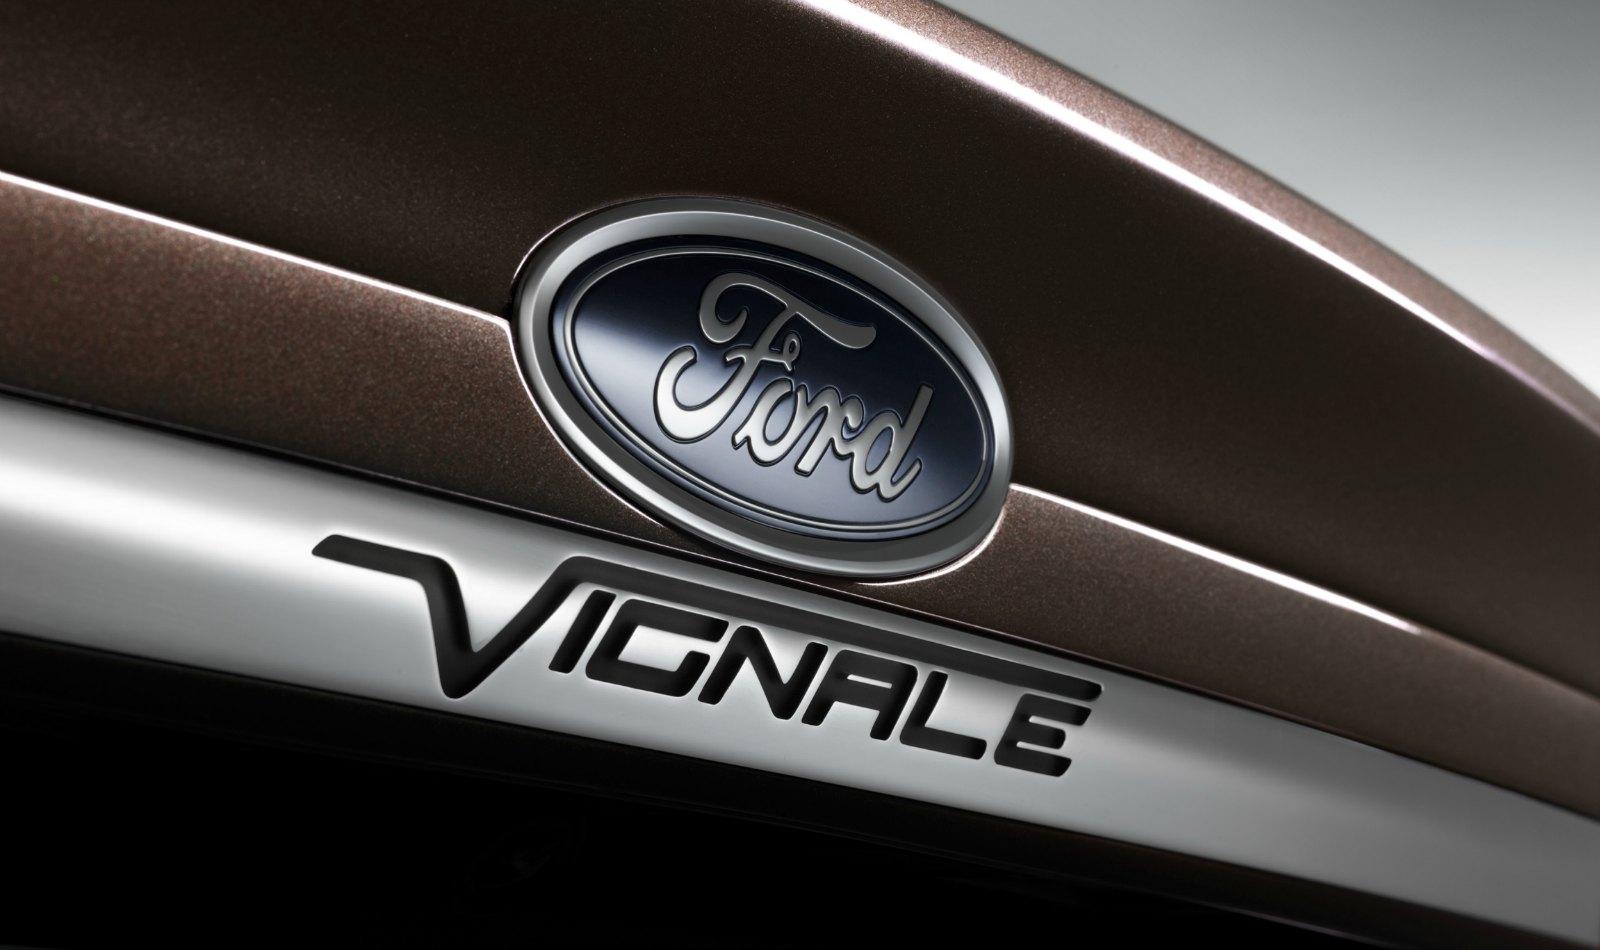 71-Ford_Vignale_04